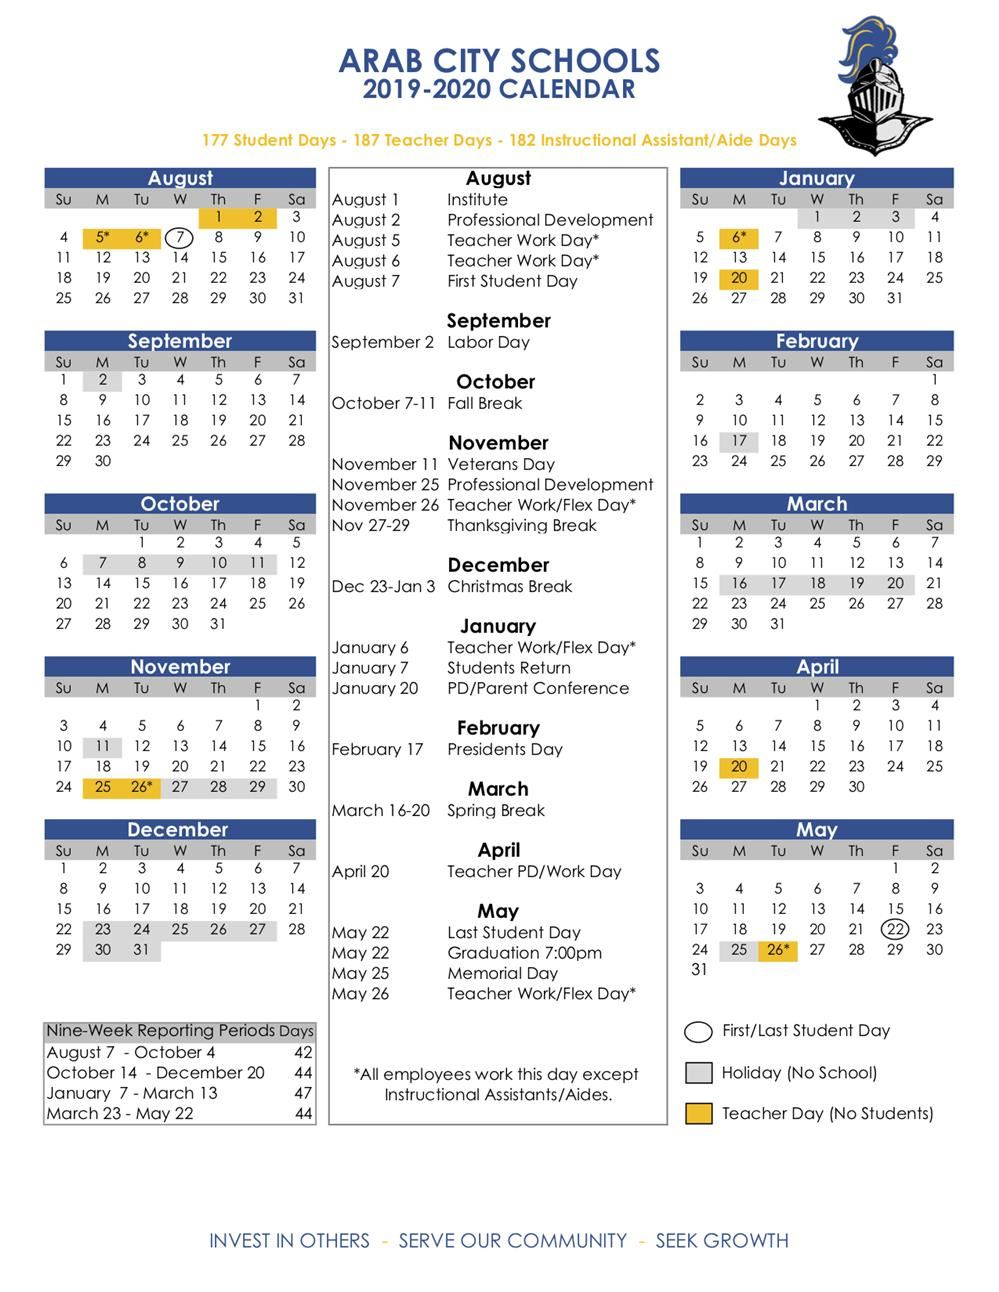 Academic Calendars / 2019-20 Acs Calendar intended for Ewish Calendar 2019 - 2020